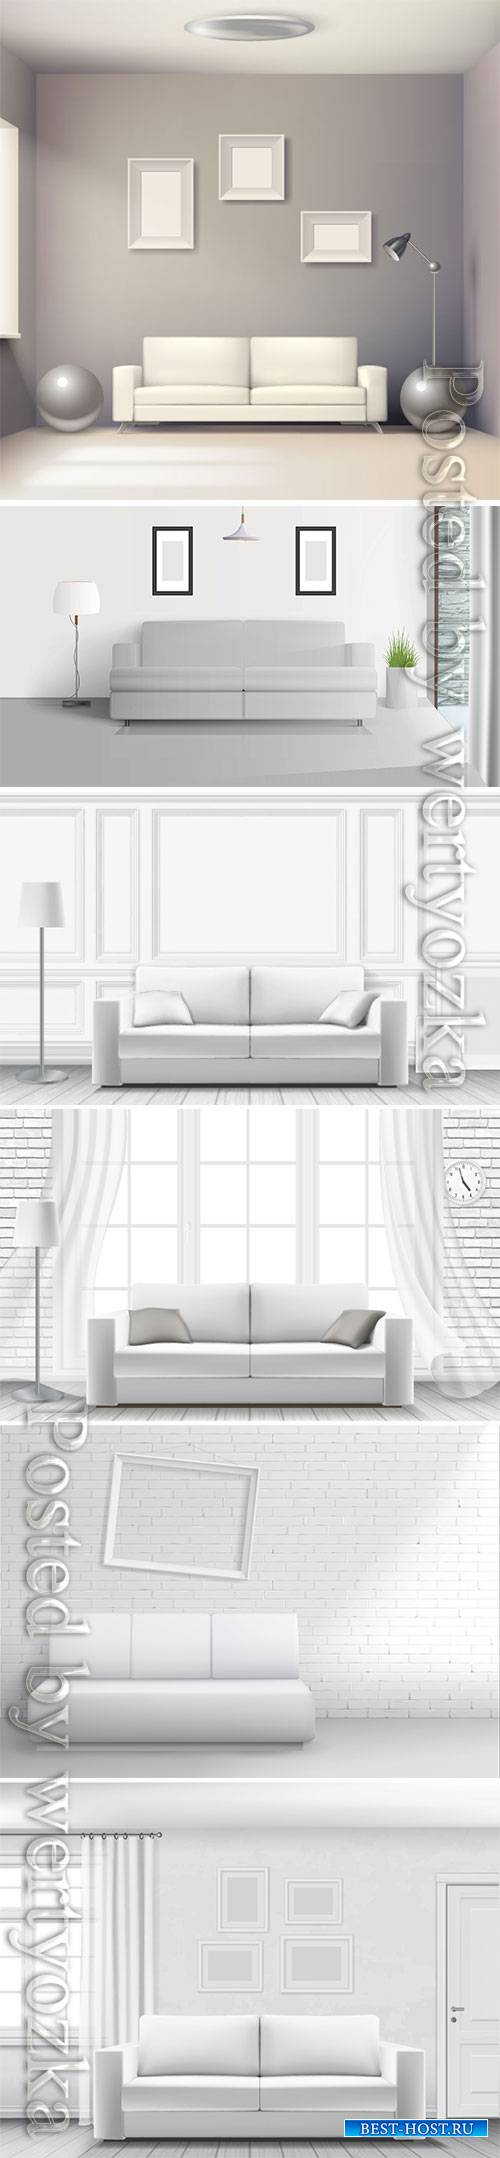 Realistic home interior vector template # 4